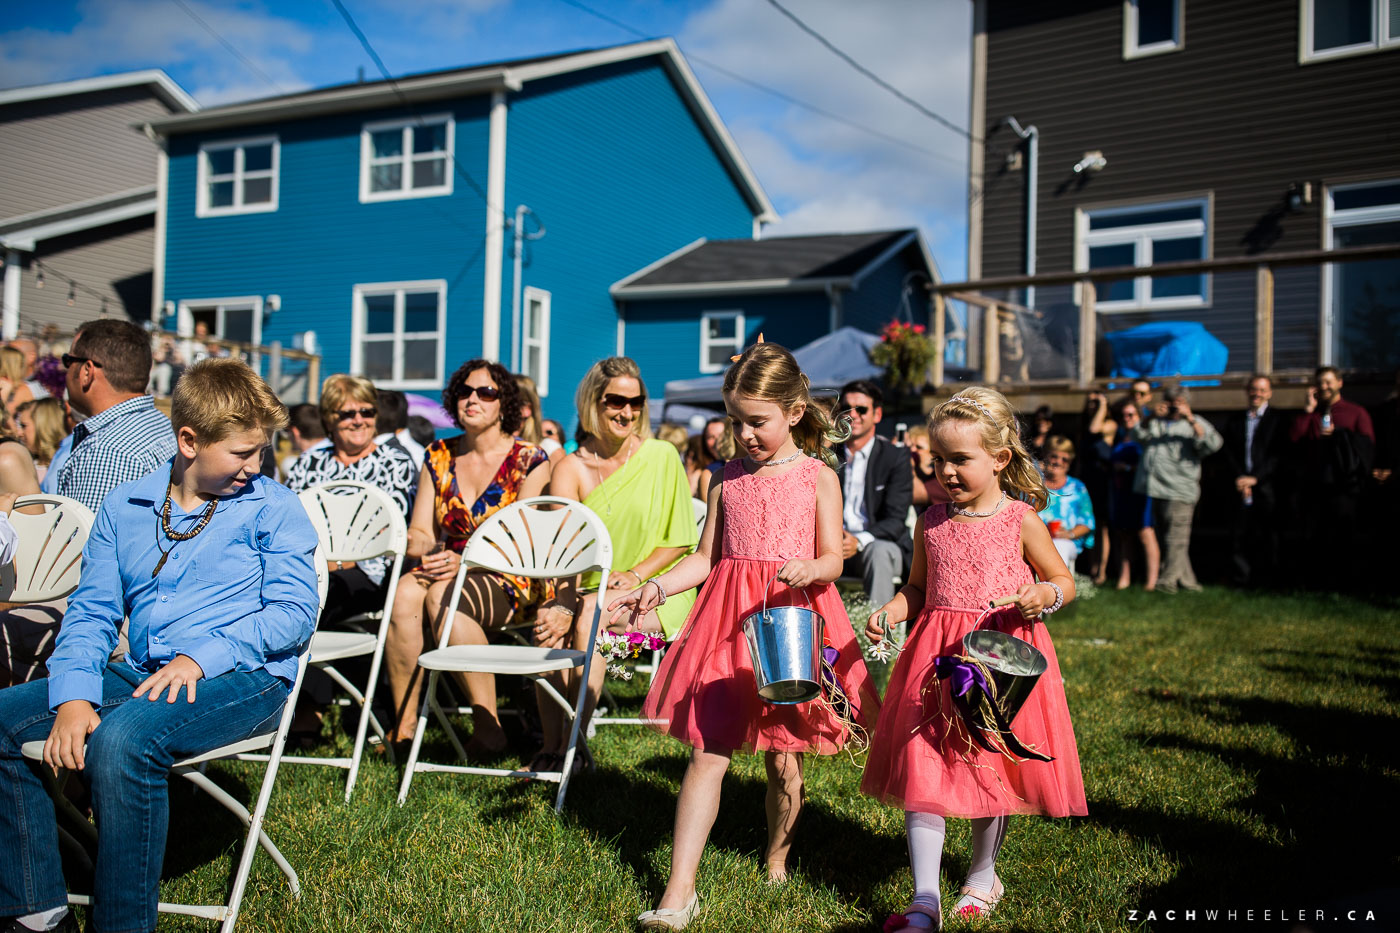 StJohns-Newfoundland-Backyard-Wedding-16